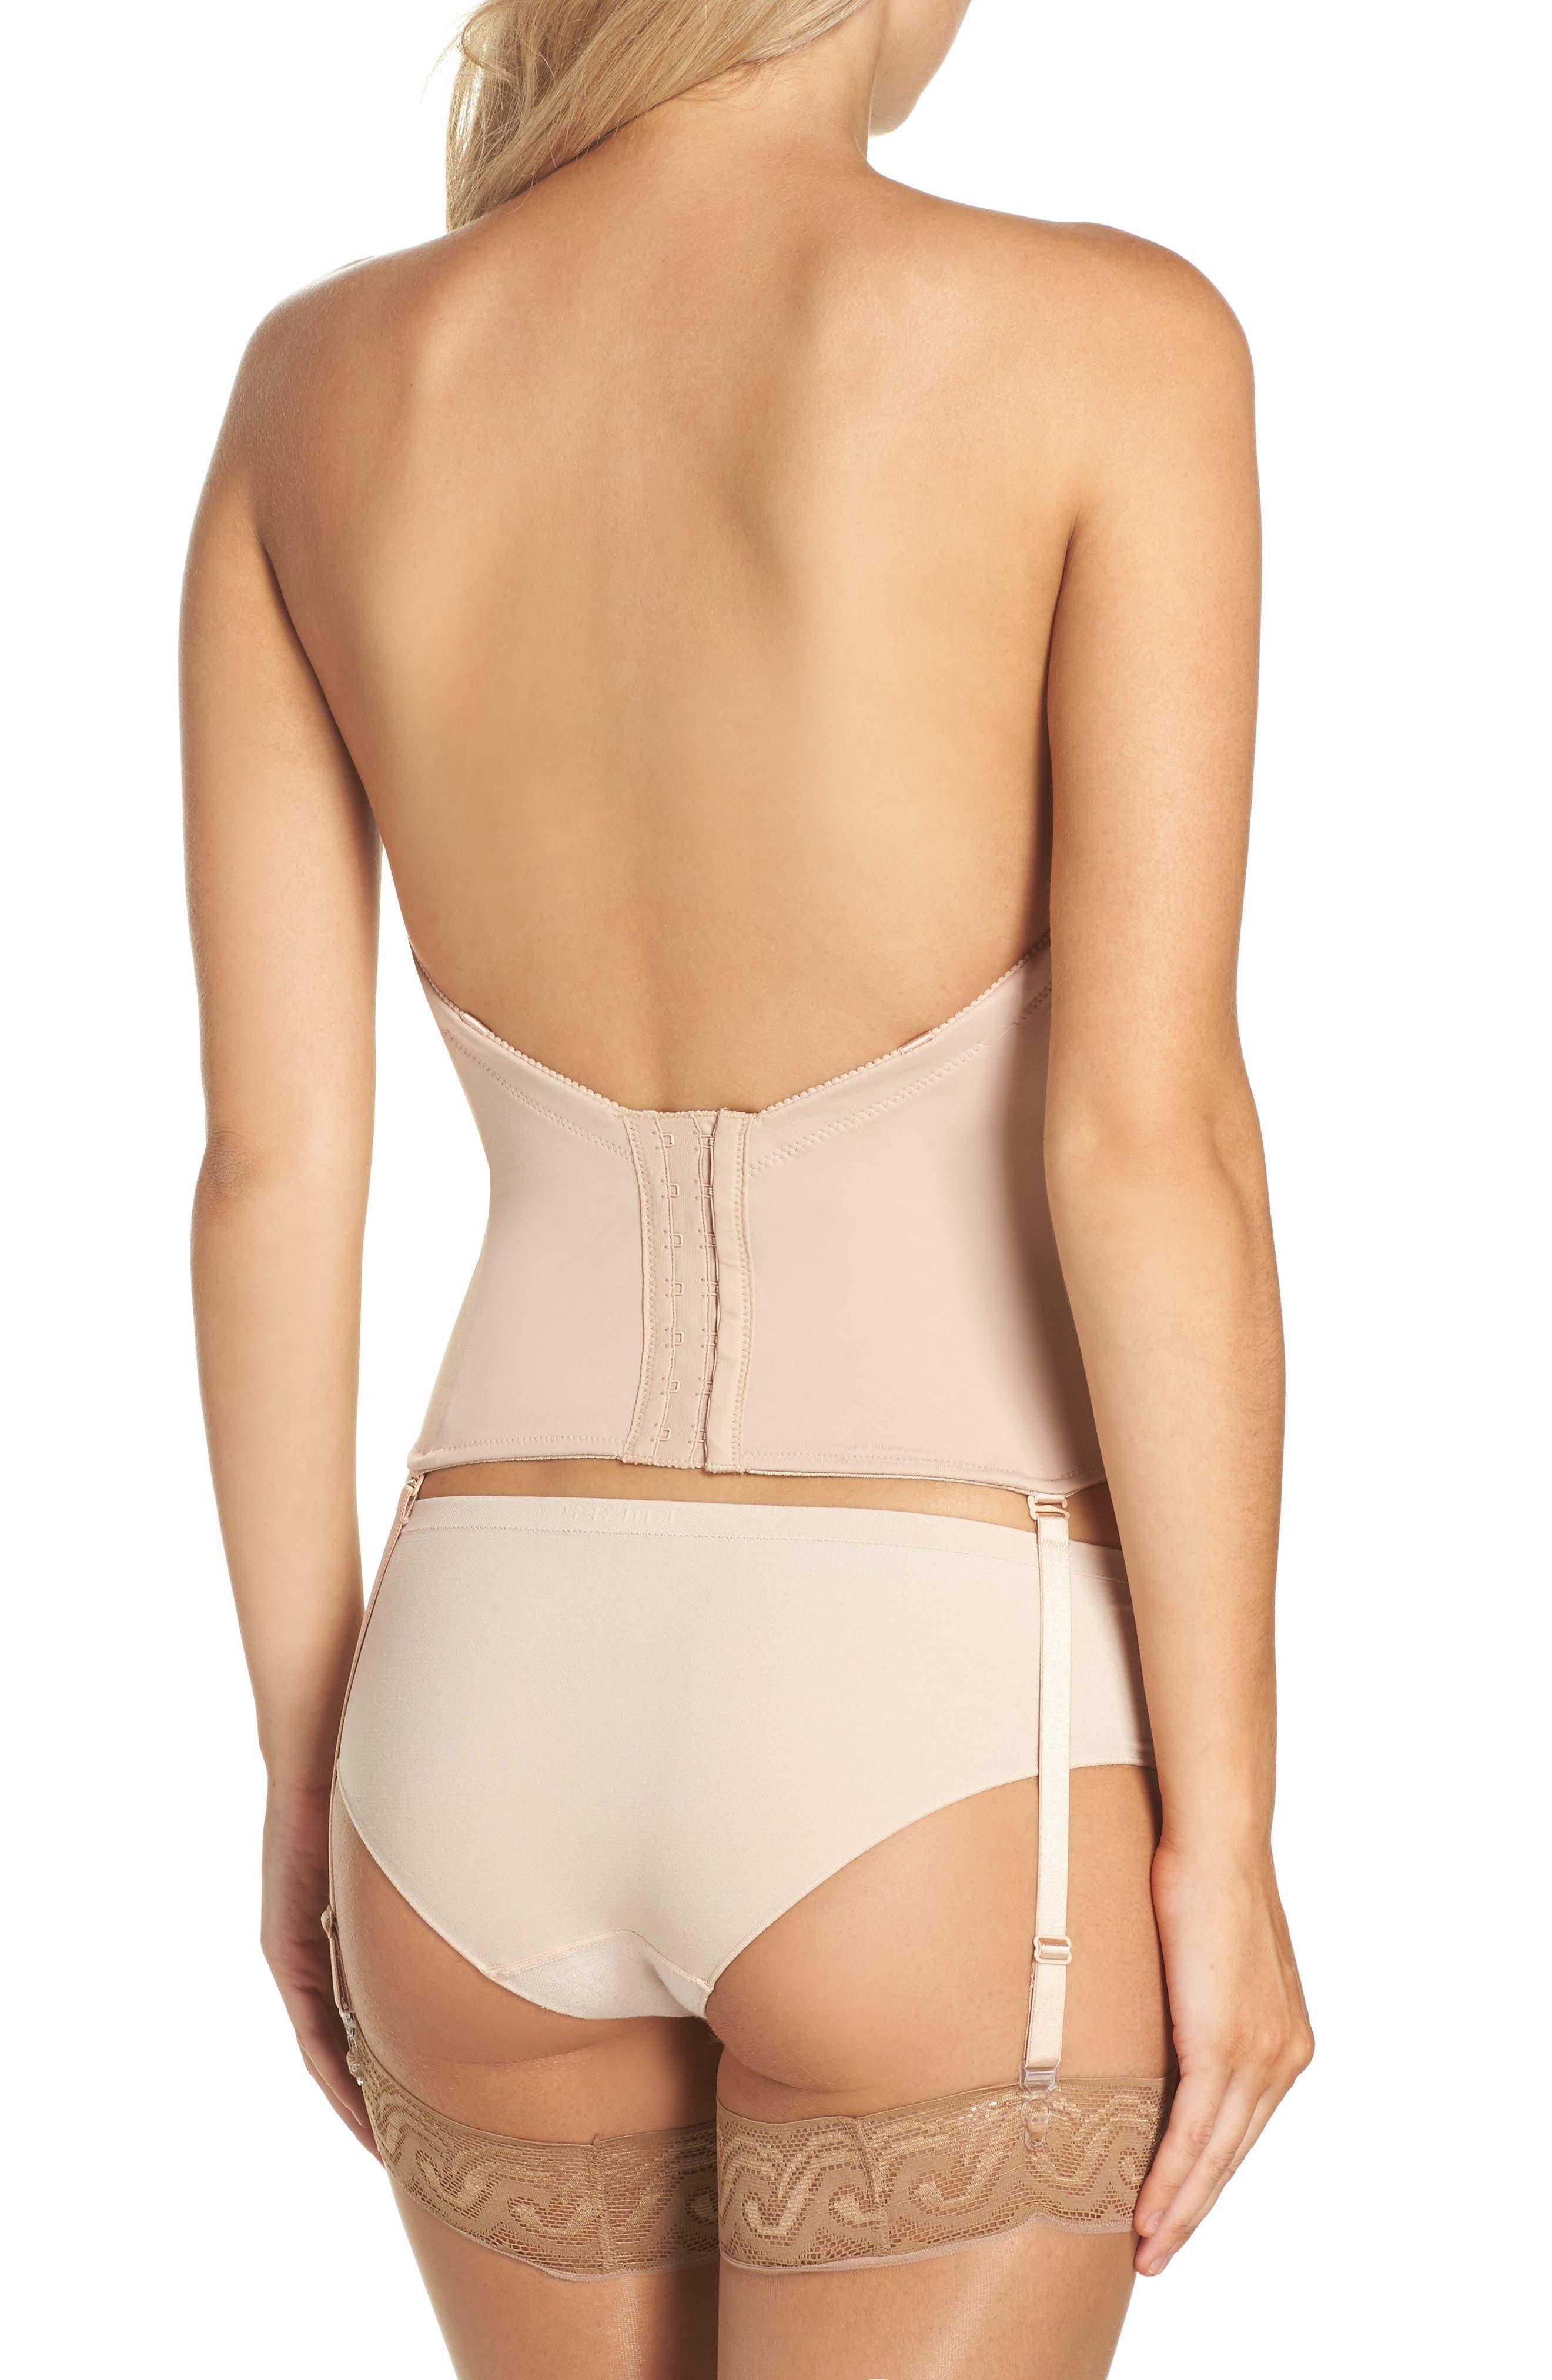 Women's Corsets & Bustiers Lingerie & Underwear   Nordstrom ...